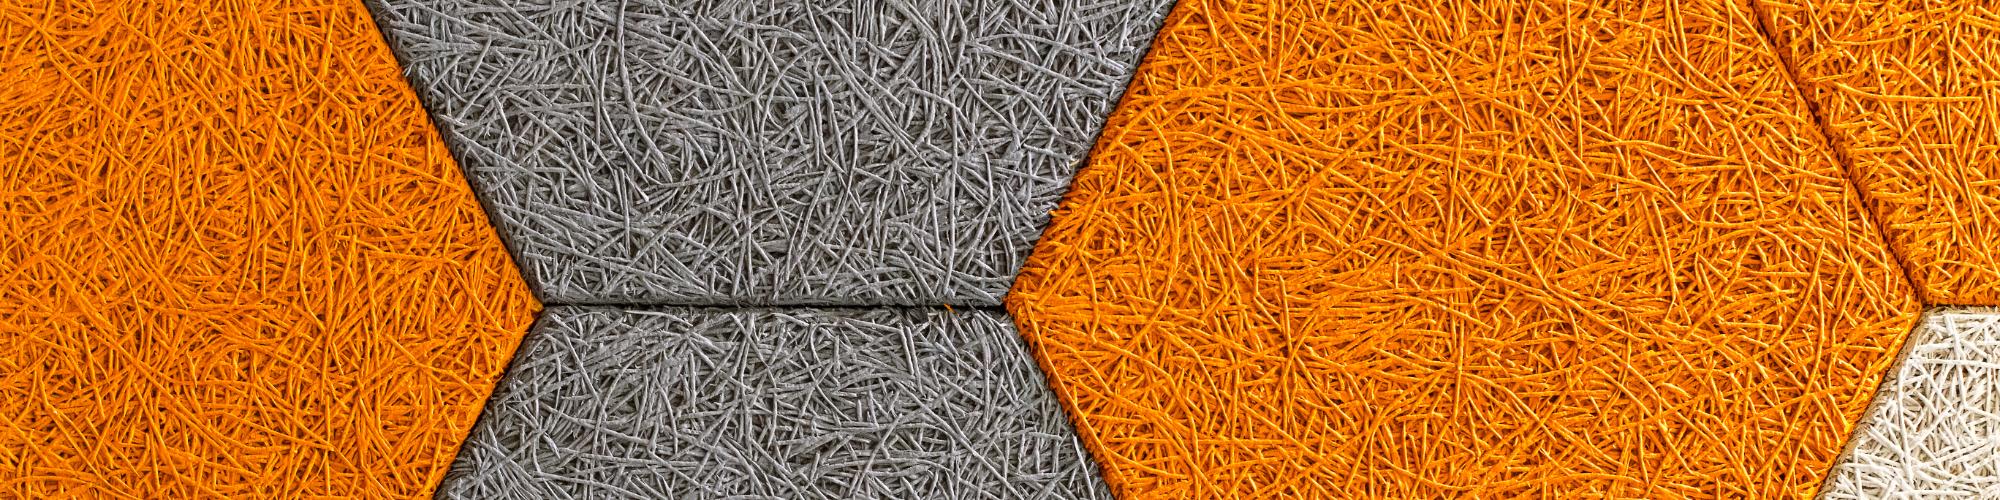 orange and grey panels